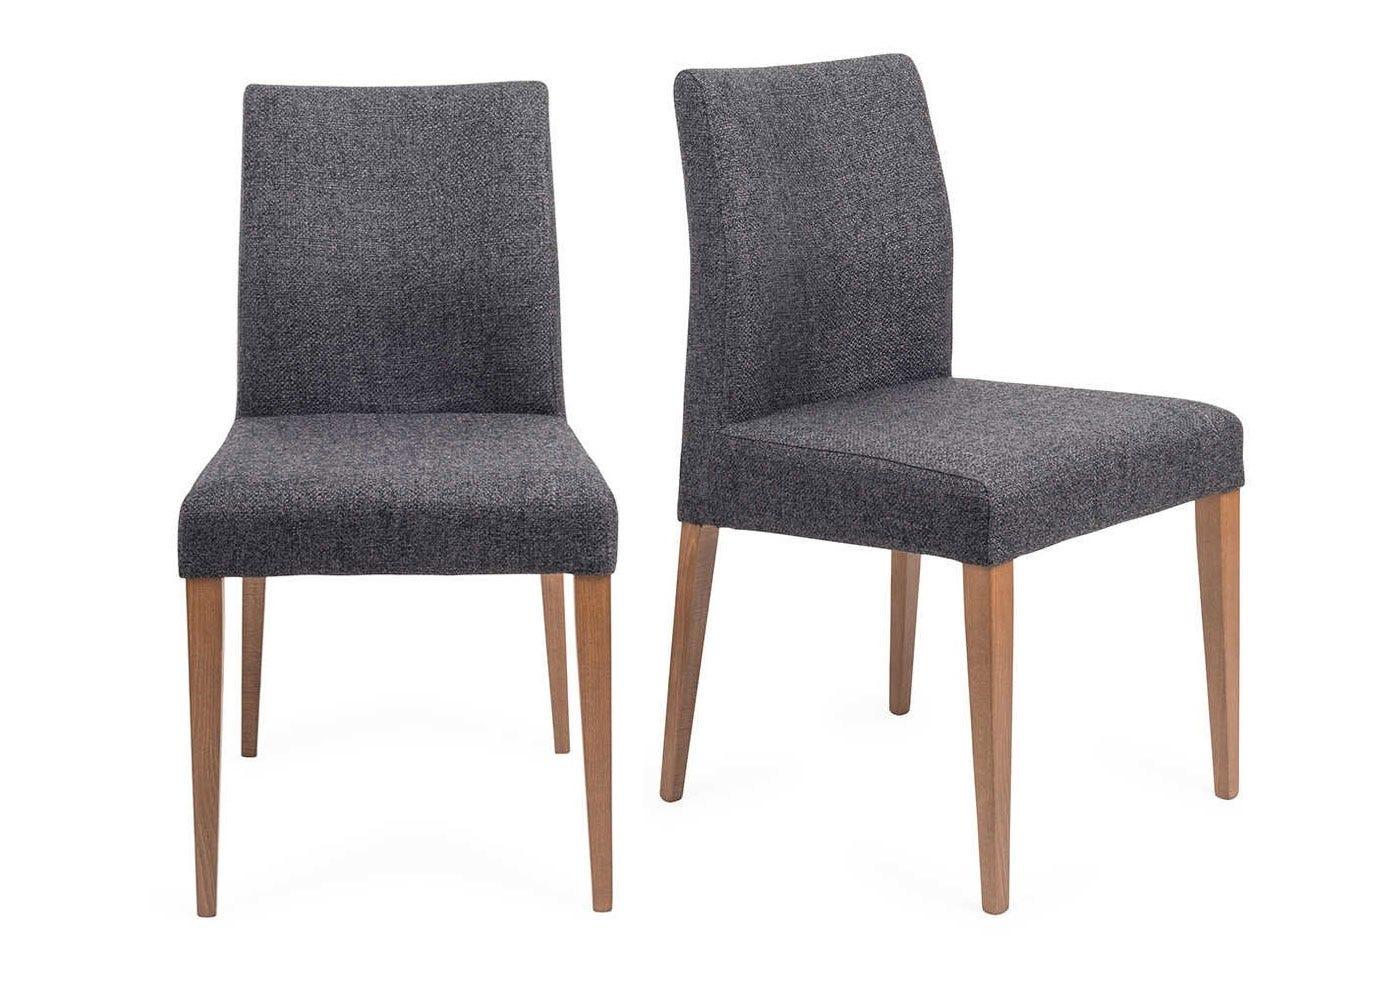 Hudson Pair of Dining Chairs Volcano Coal Dark Stain Legs